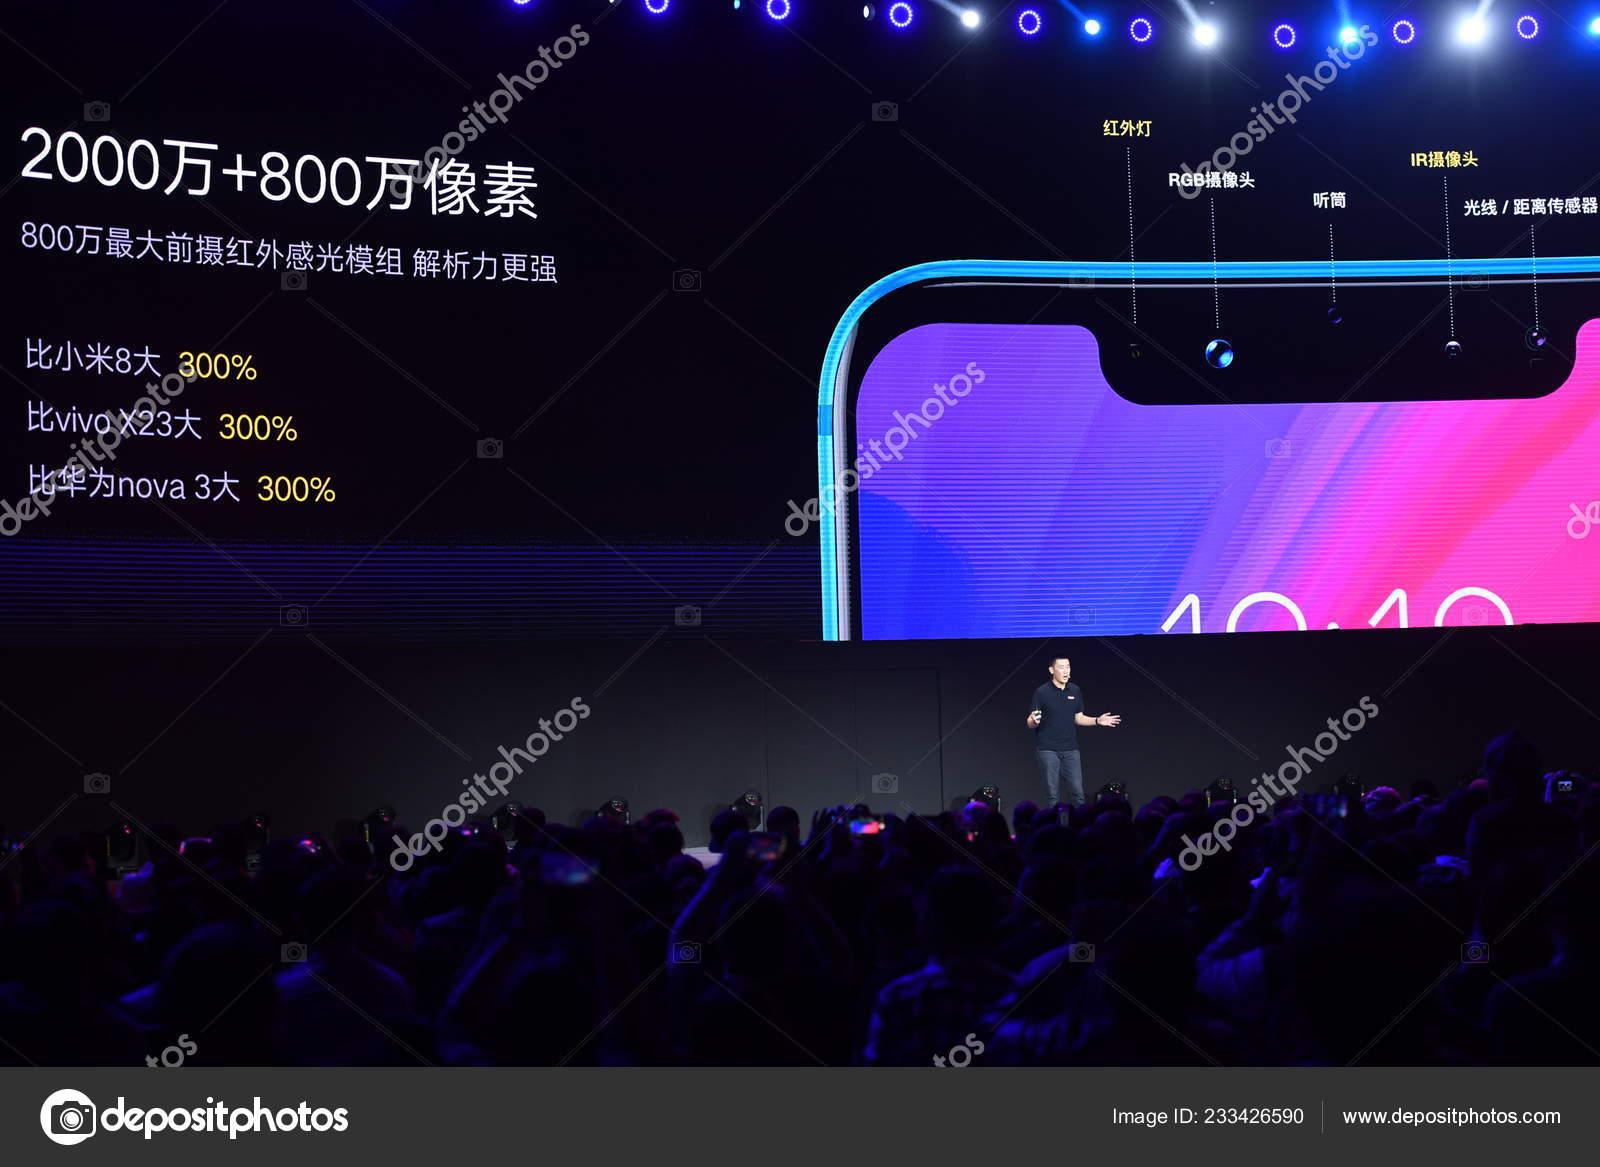 Chang Cheng Vice President Lenovo Ceo Zuk Mobile Subsidiary